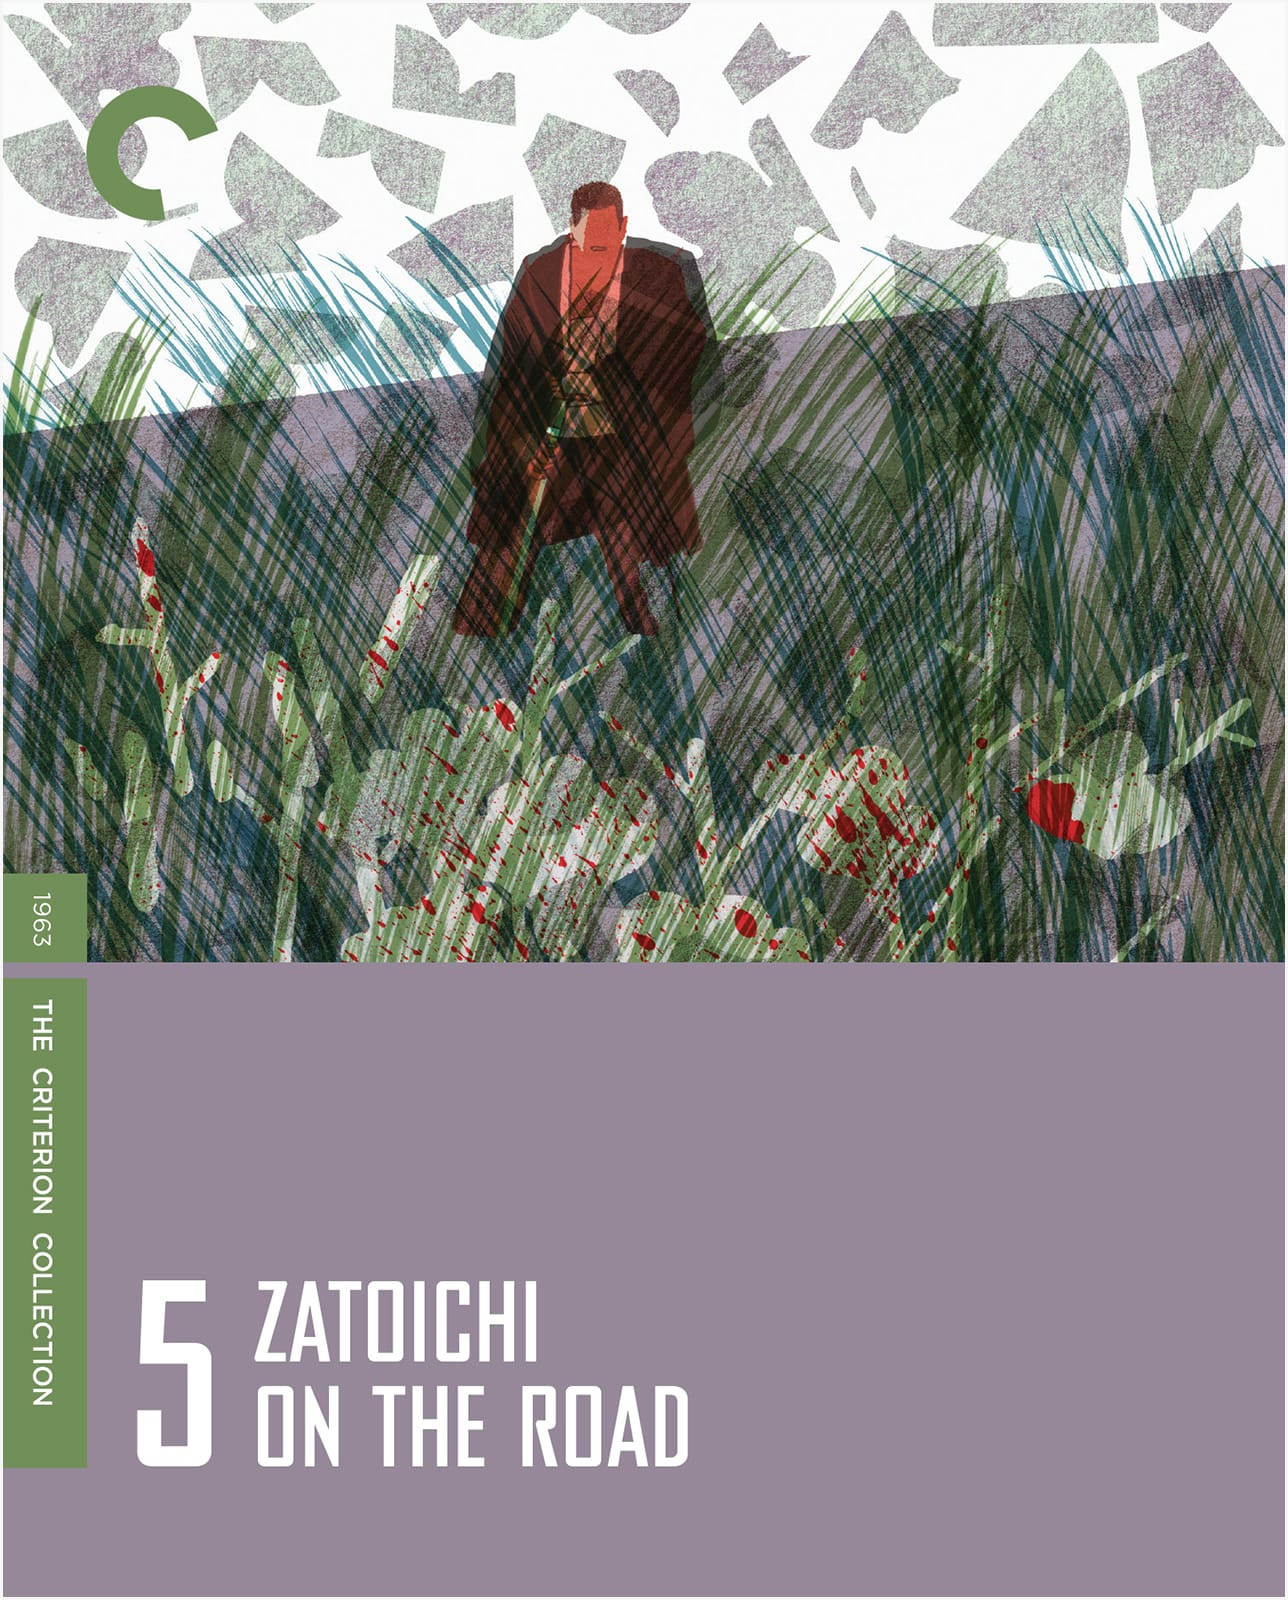 Zatoichi On The Road 1963 The Criterion Collection